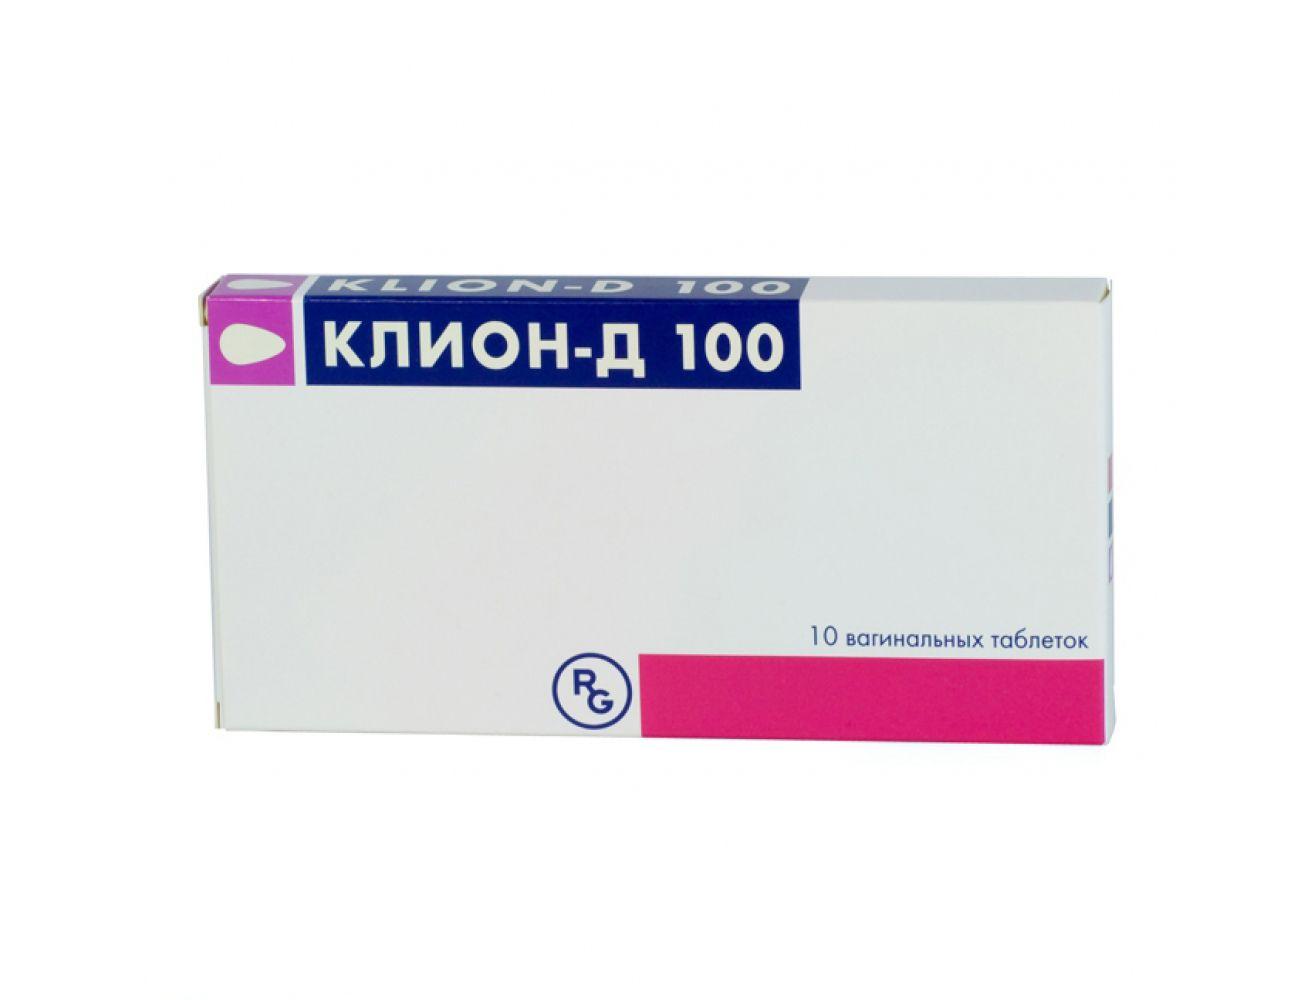 фото упаковки Клион-Д 100